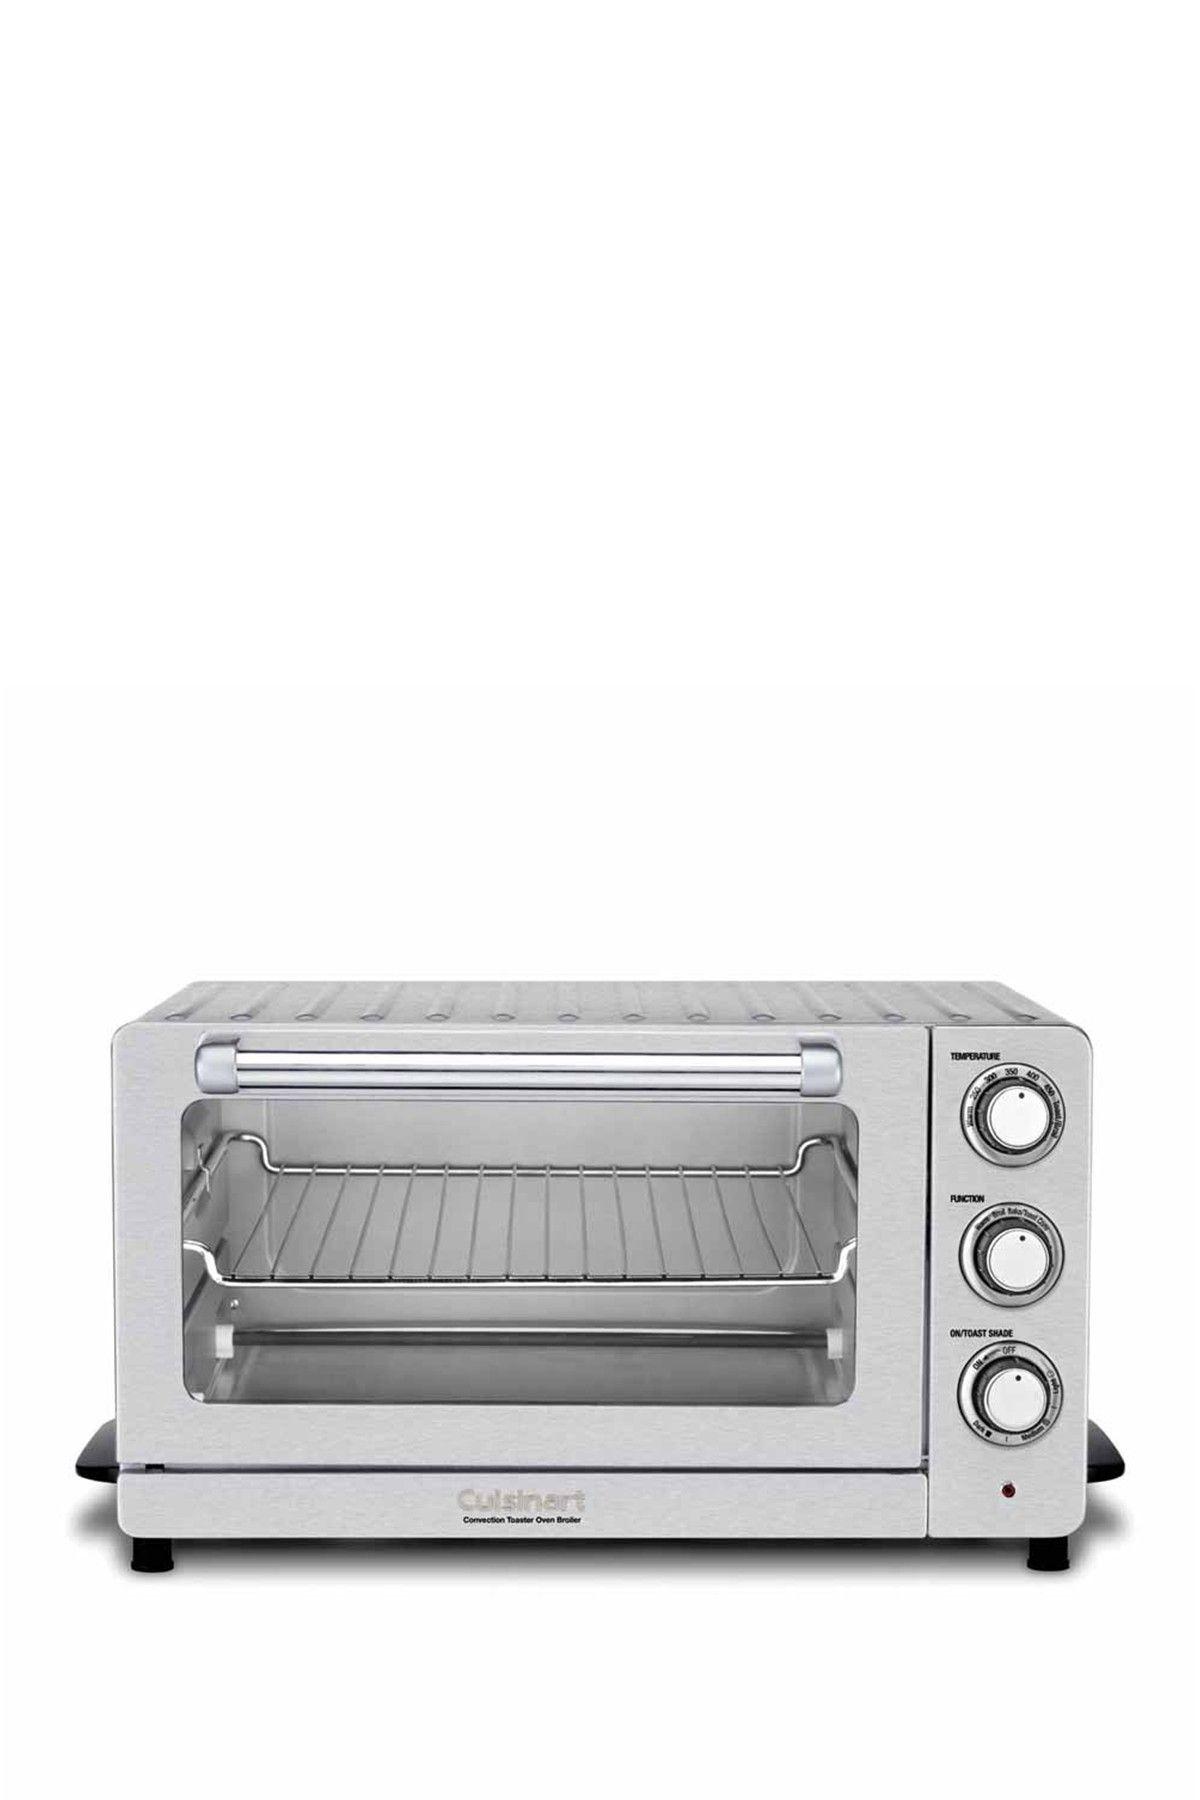 Cuisinart Toaster Oven Broiler Toaster Stainless Steel Toaster Countertop Oven